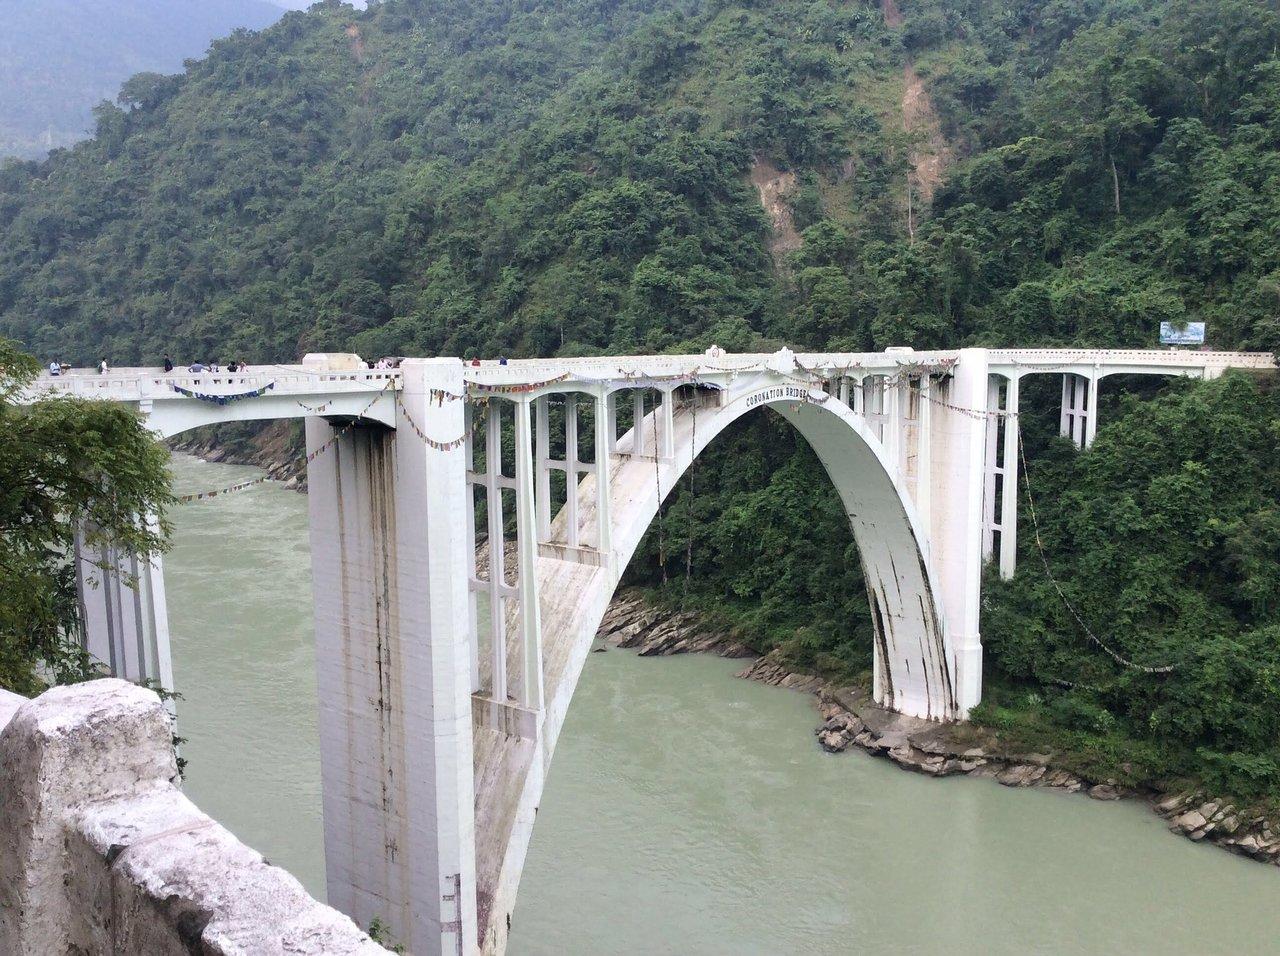 Top Things To Do in Siliguri - Visiting the Beautiful Sevoke Bridge